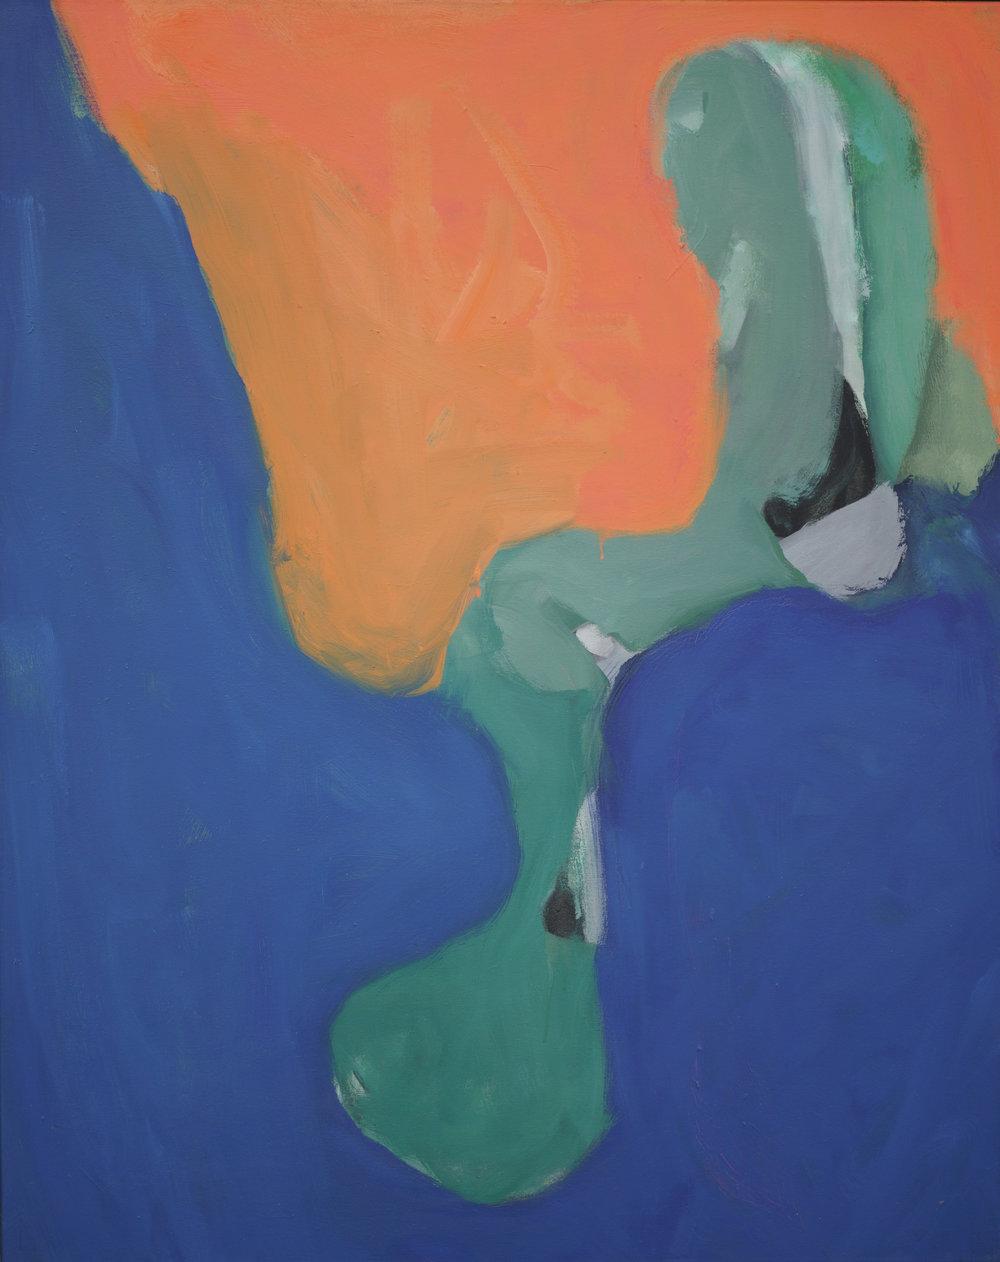 Somyot Hananuntasuk, 2013_05 , 2013, Oil on Canvas, 100 x 80 cm